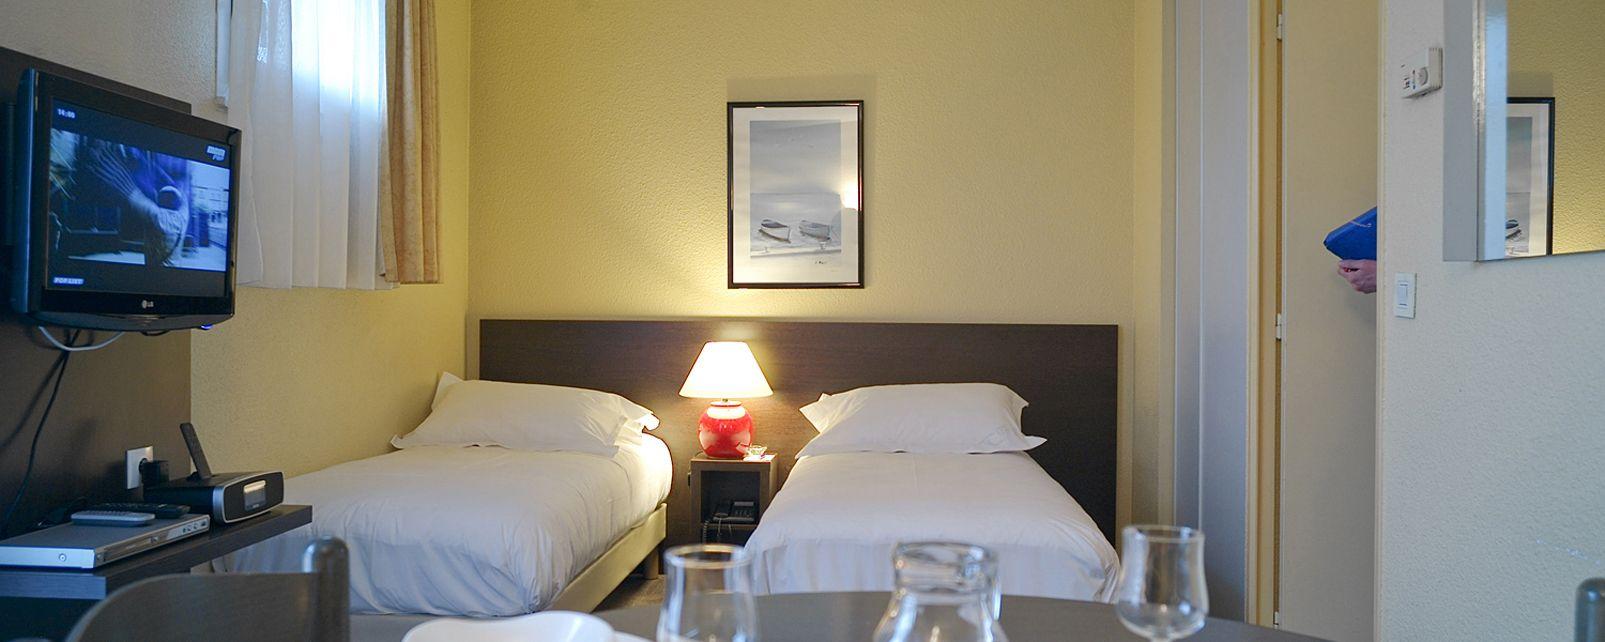 Hotel Citadines Cannes Carnot Apart'Hotel